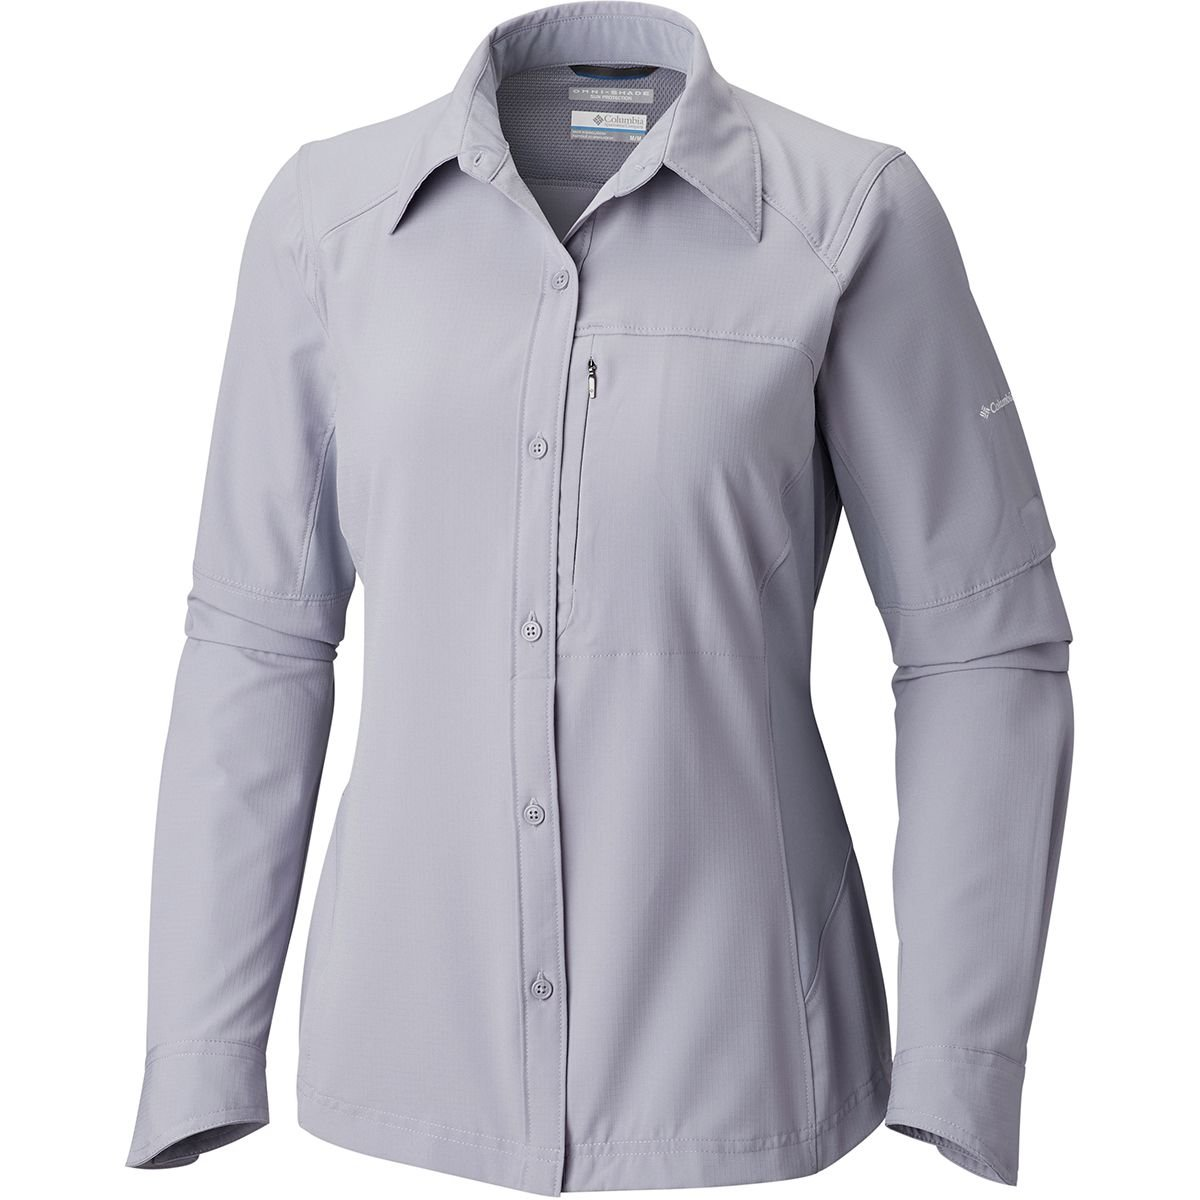 Columbia Silver Ridge Long Sleeve Shirt - Blusa para mujer: Amazon.es: Deportes y aire libre